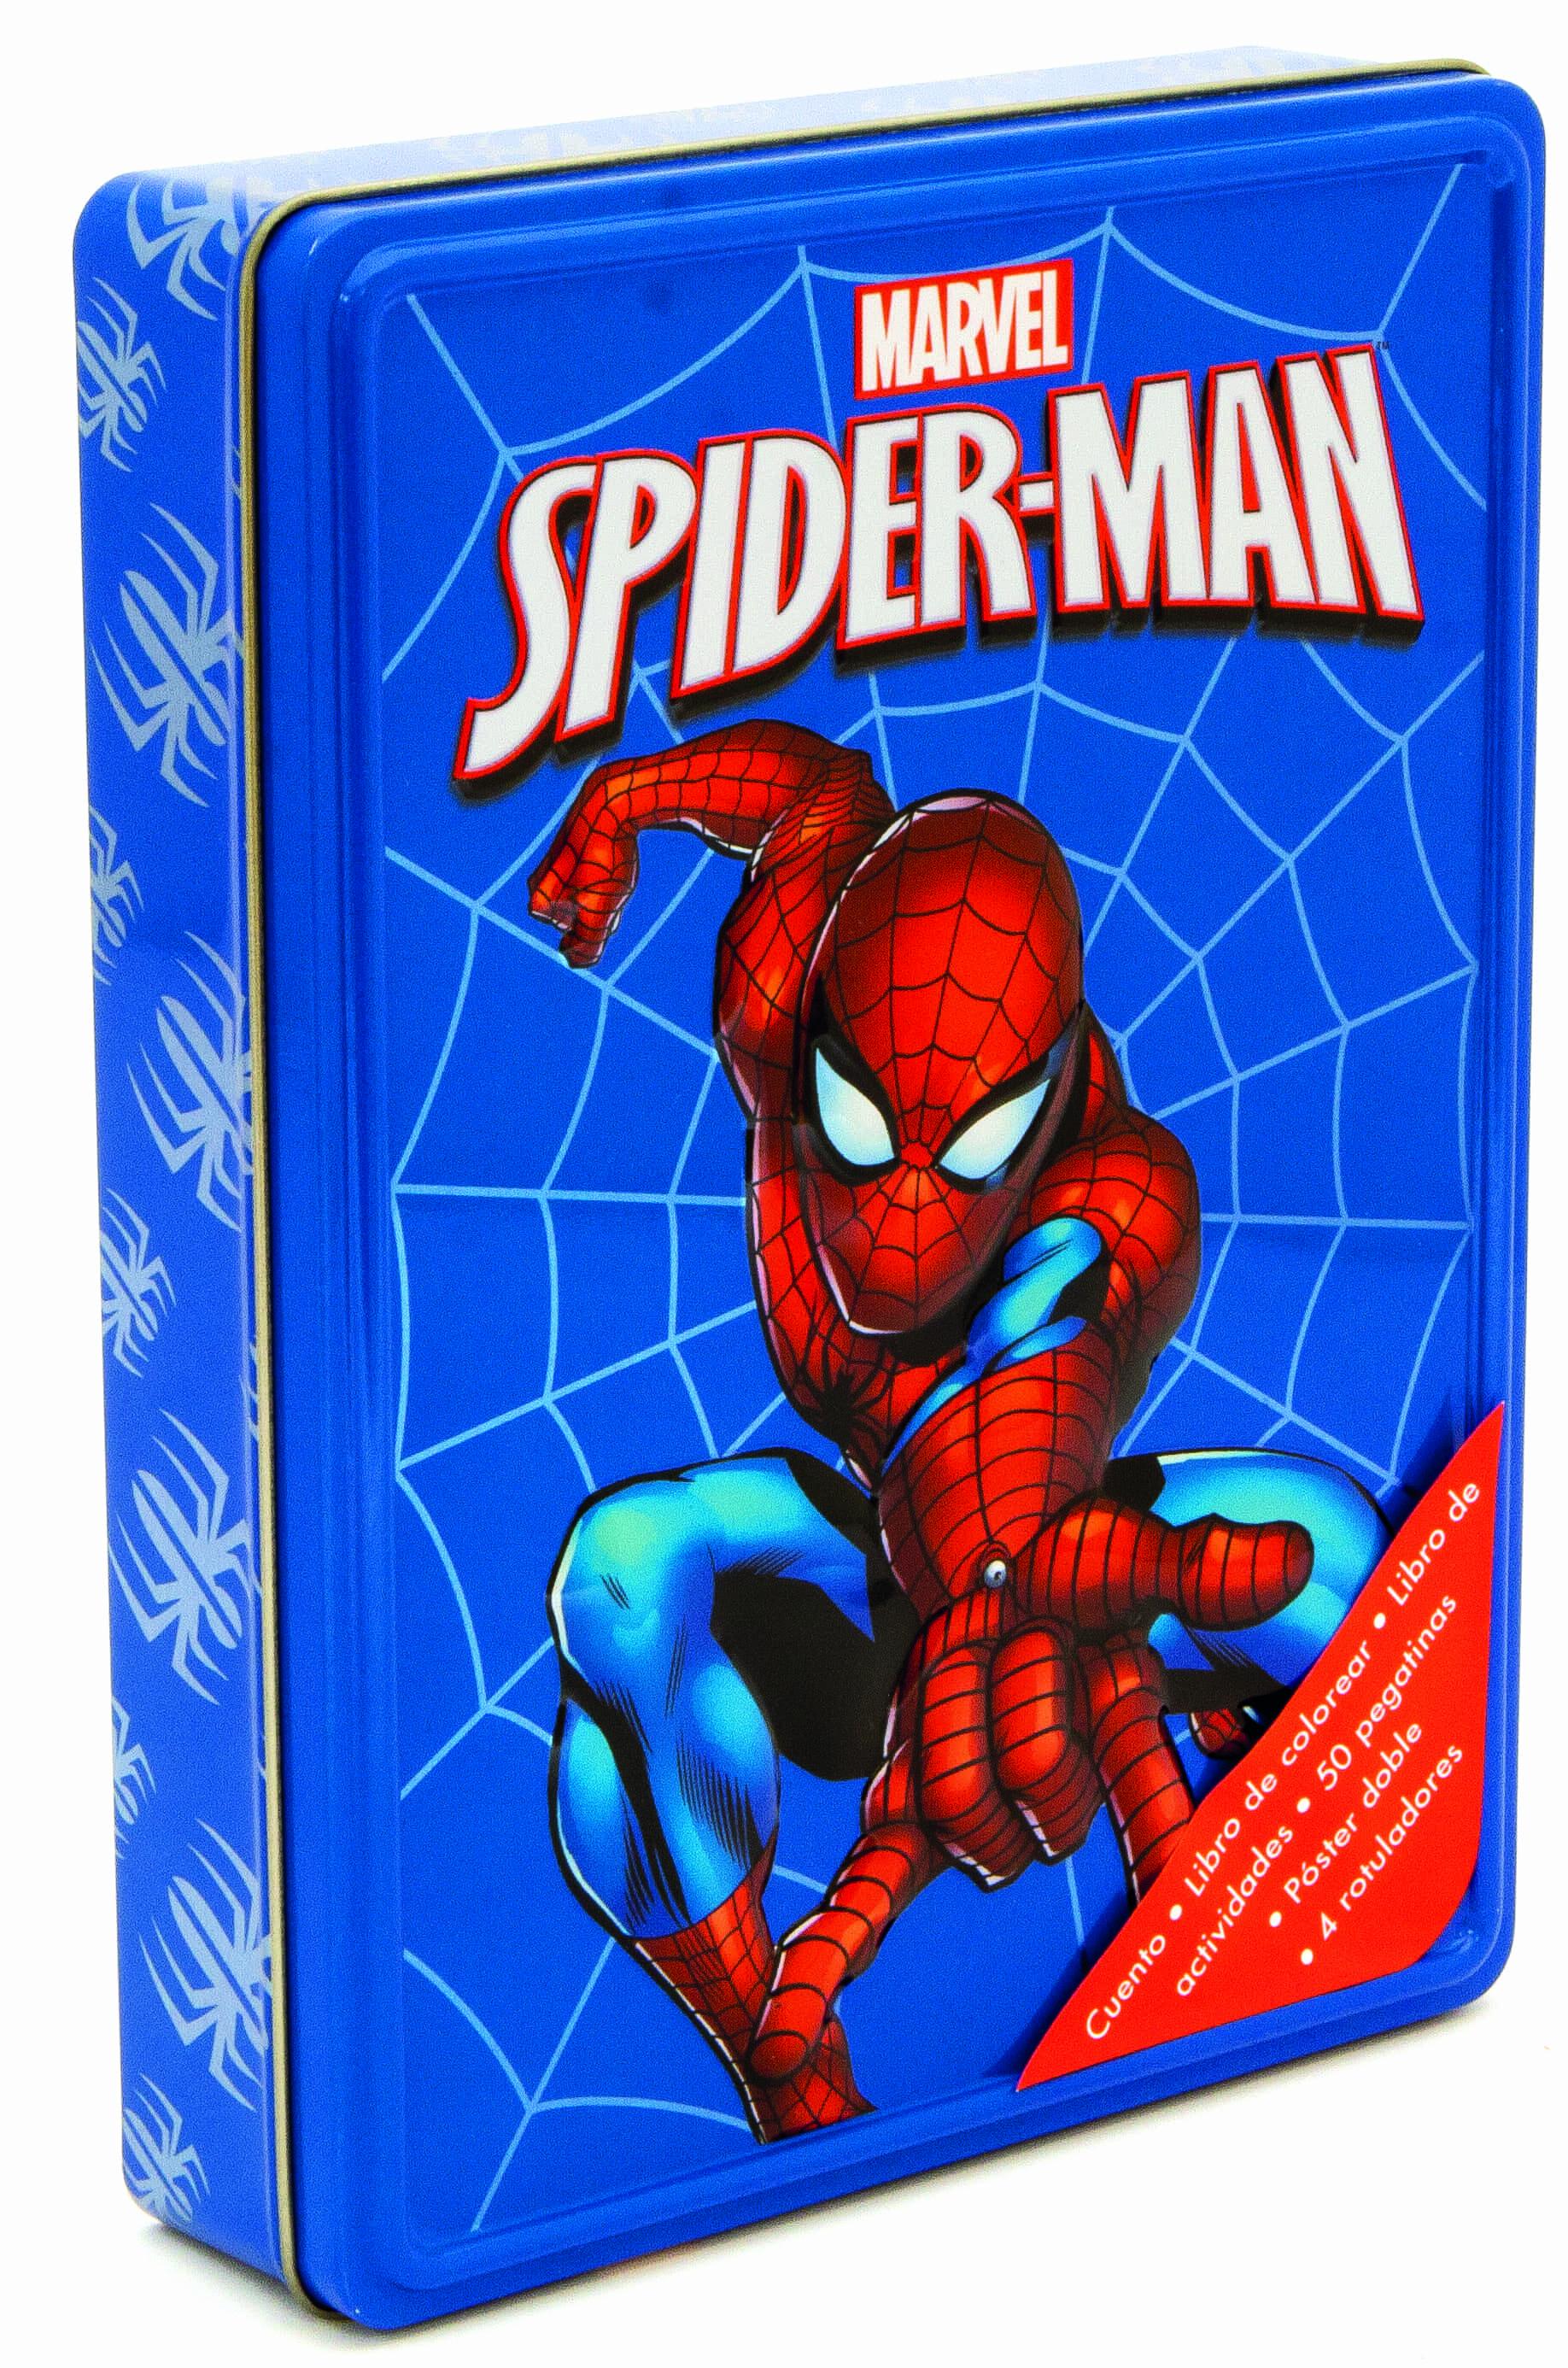 SPIDERMAN (CAJA METALICA) | VV.AA. | Comprar libro 9788415343745